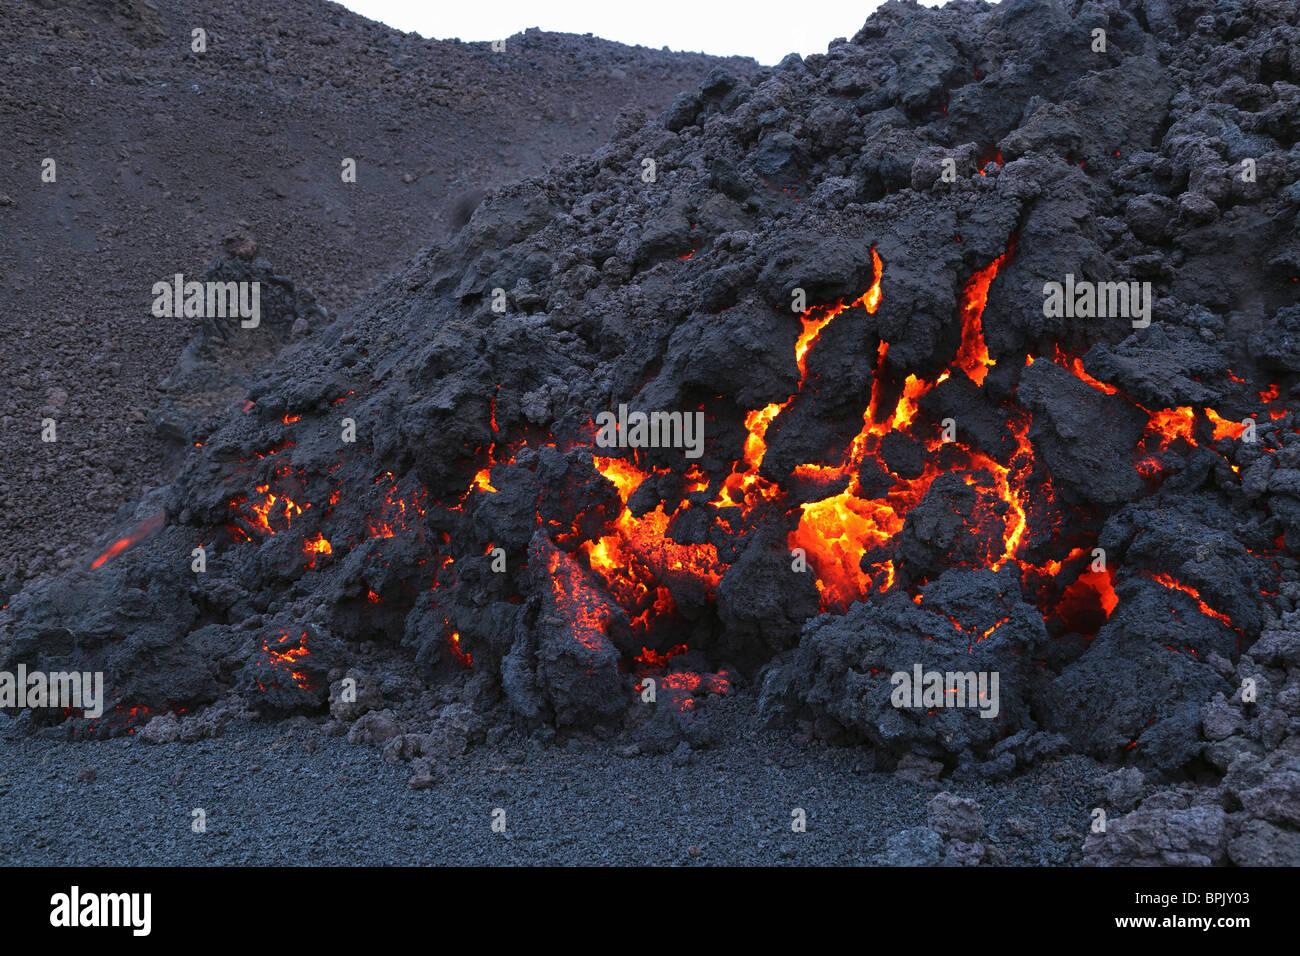 March 26, 2010 - Fimmvörduhals lava flow, Eyjafjallajökull, Iceland. - Stock Image